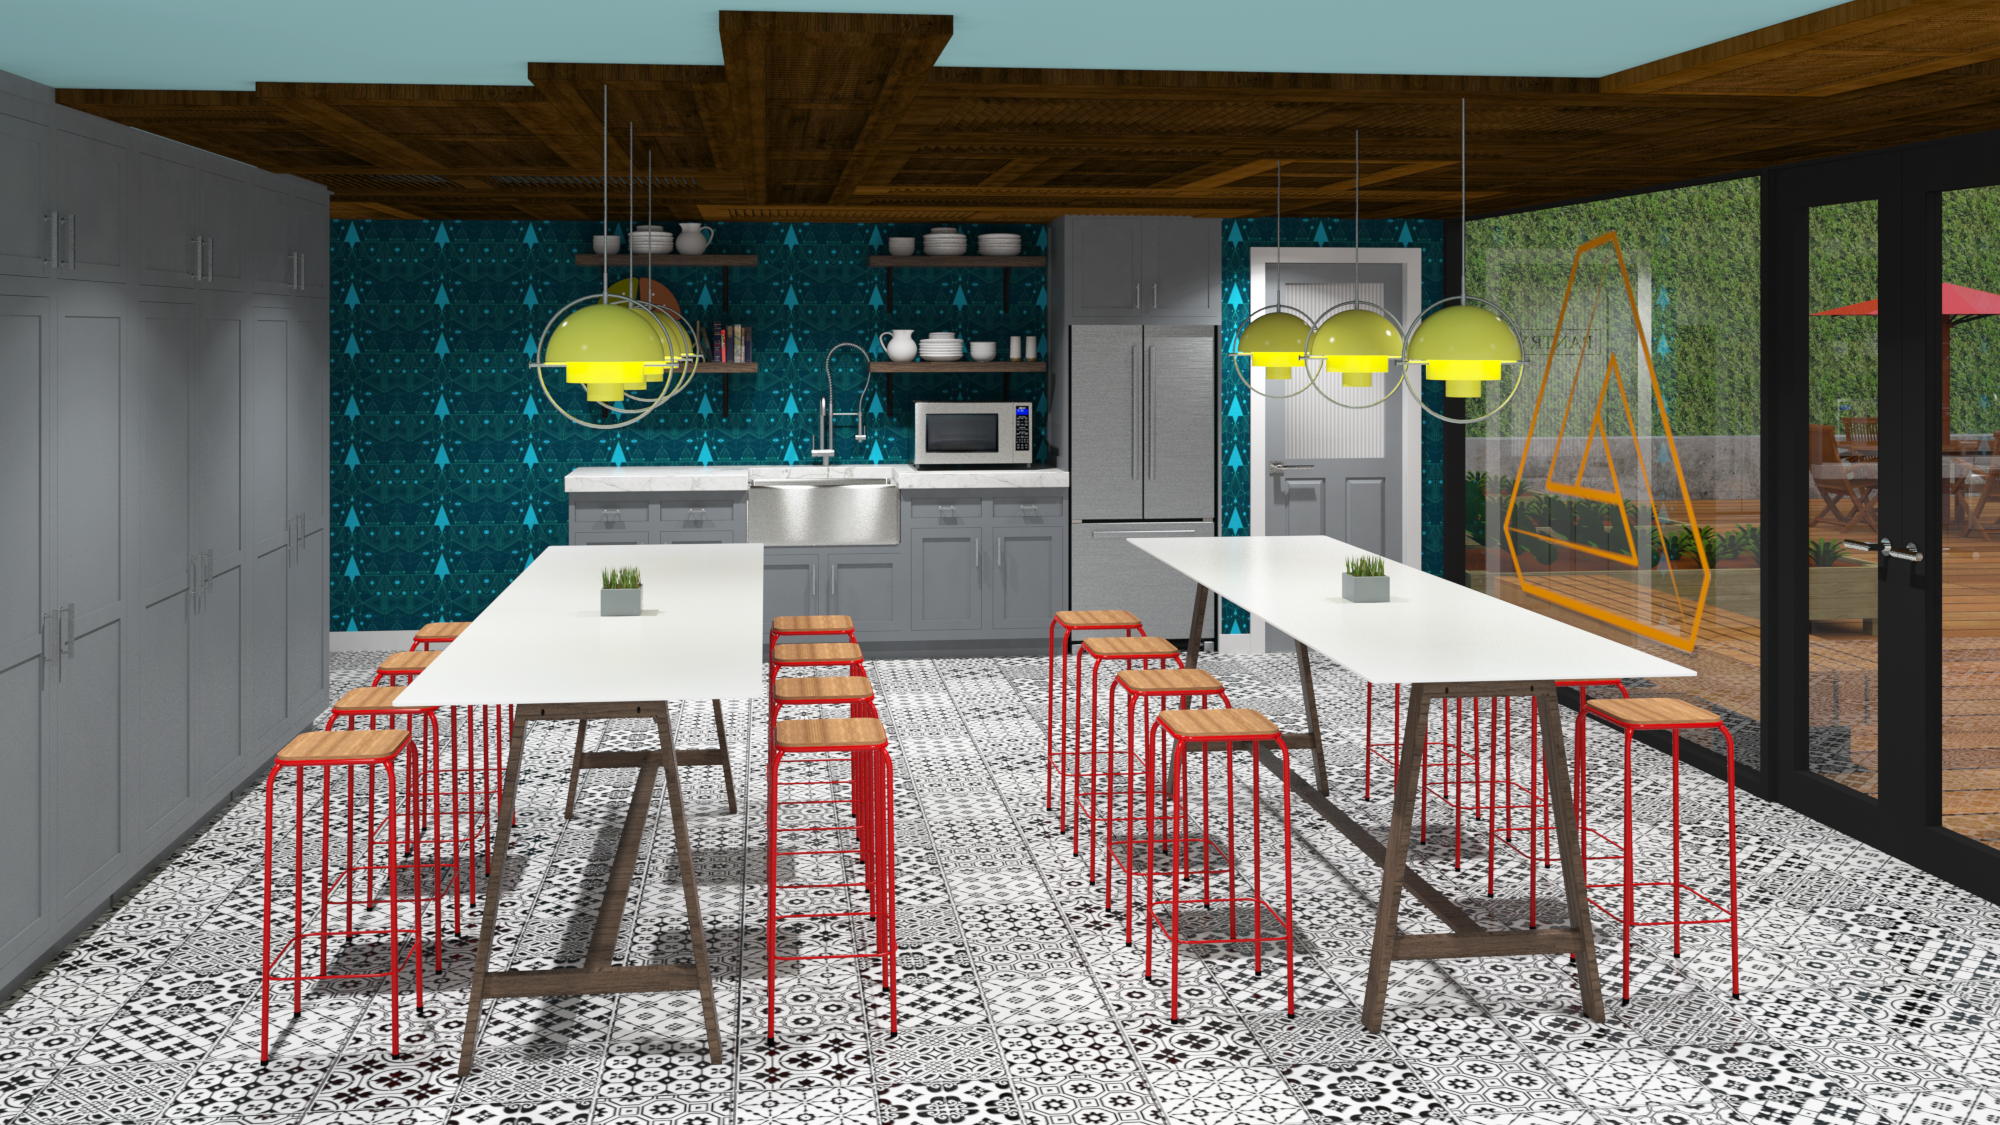 QuasarStudios_Kitchen 012317.png